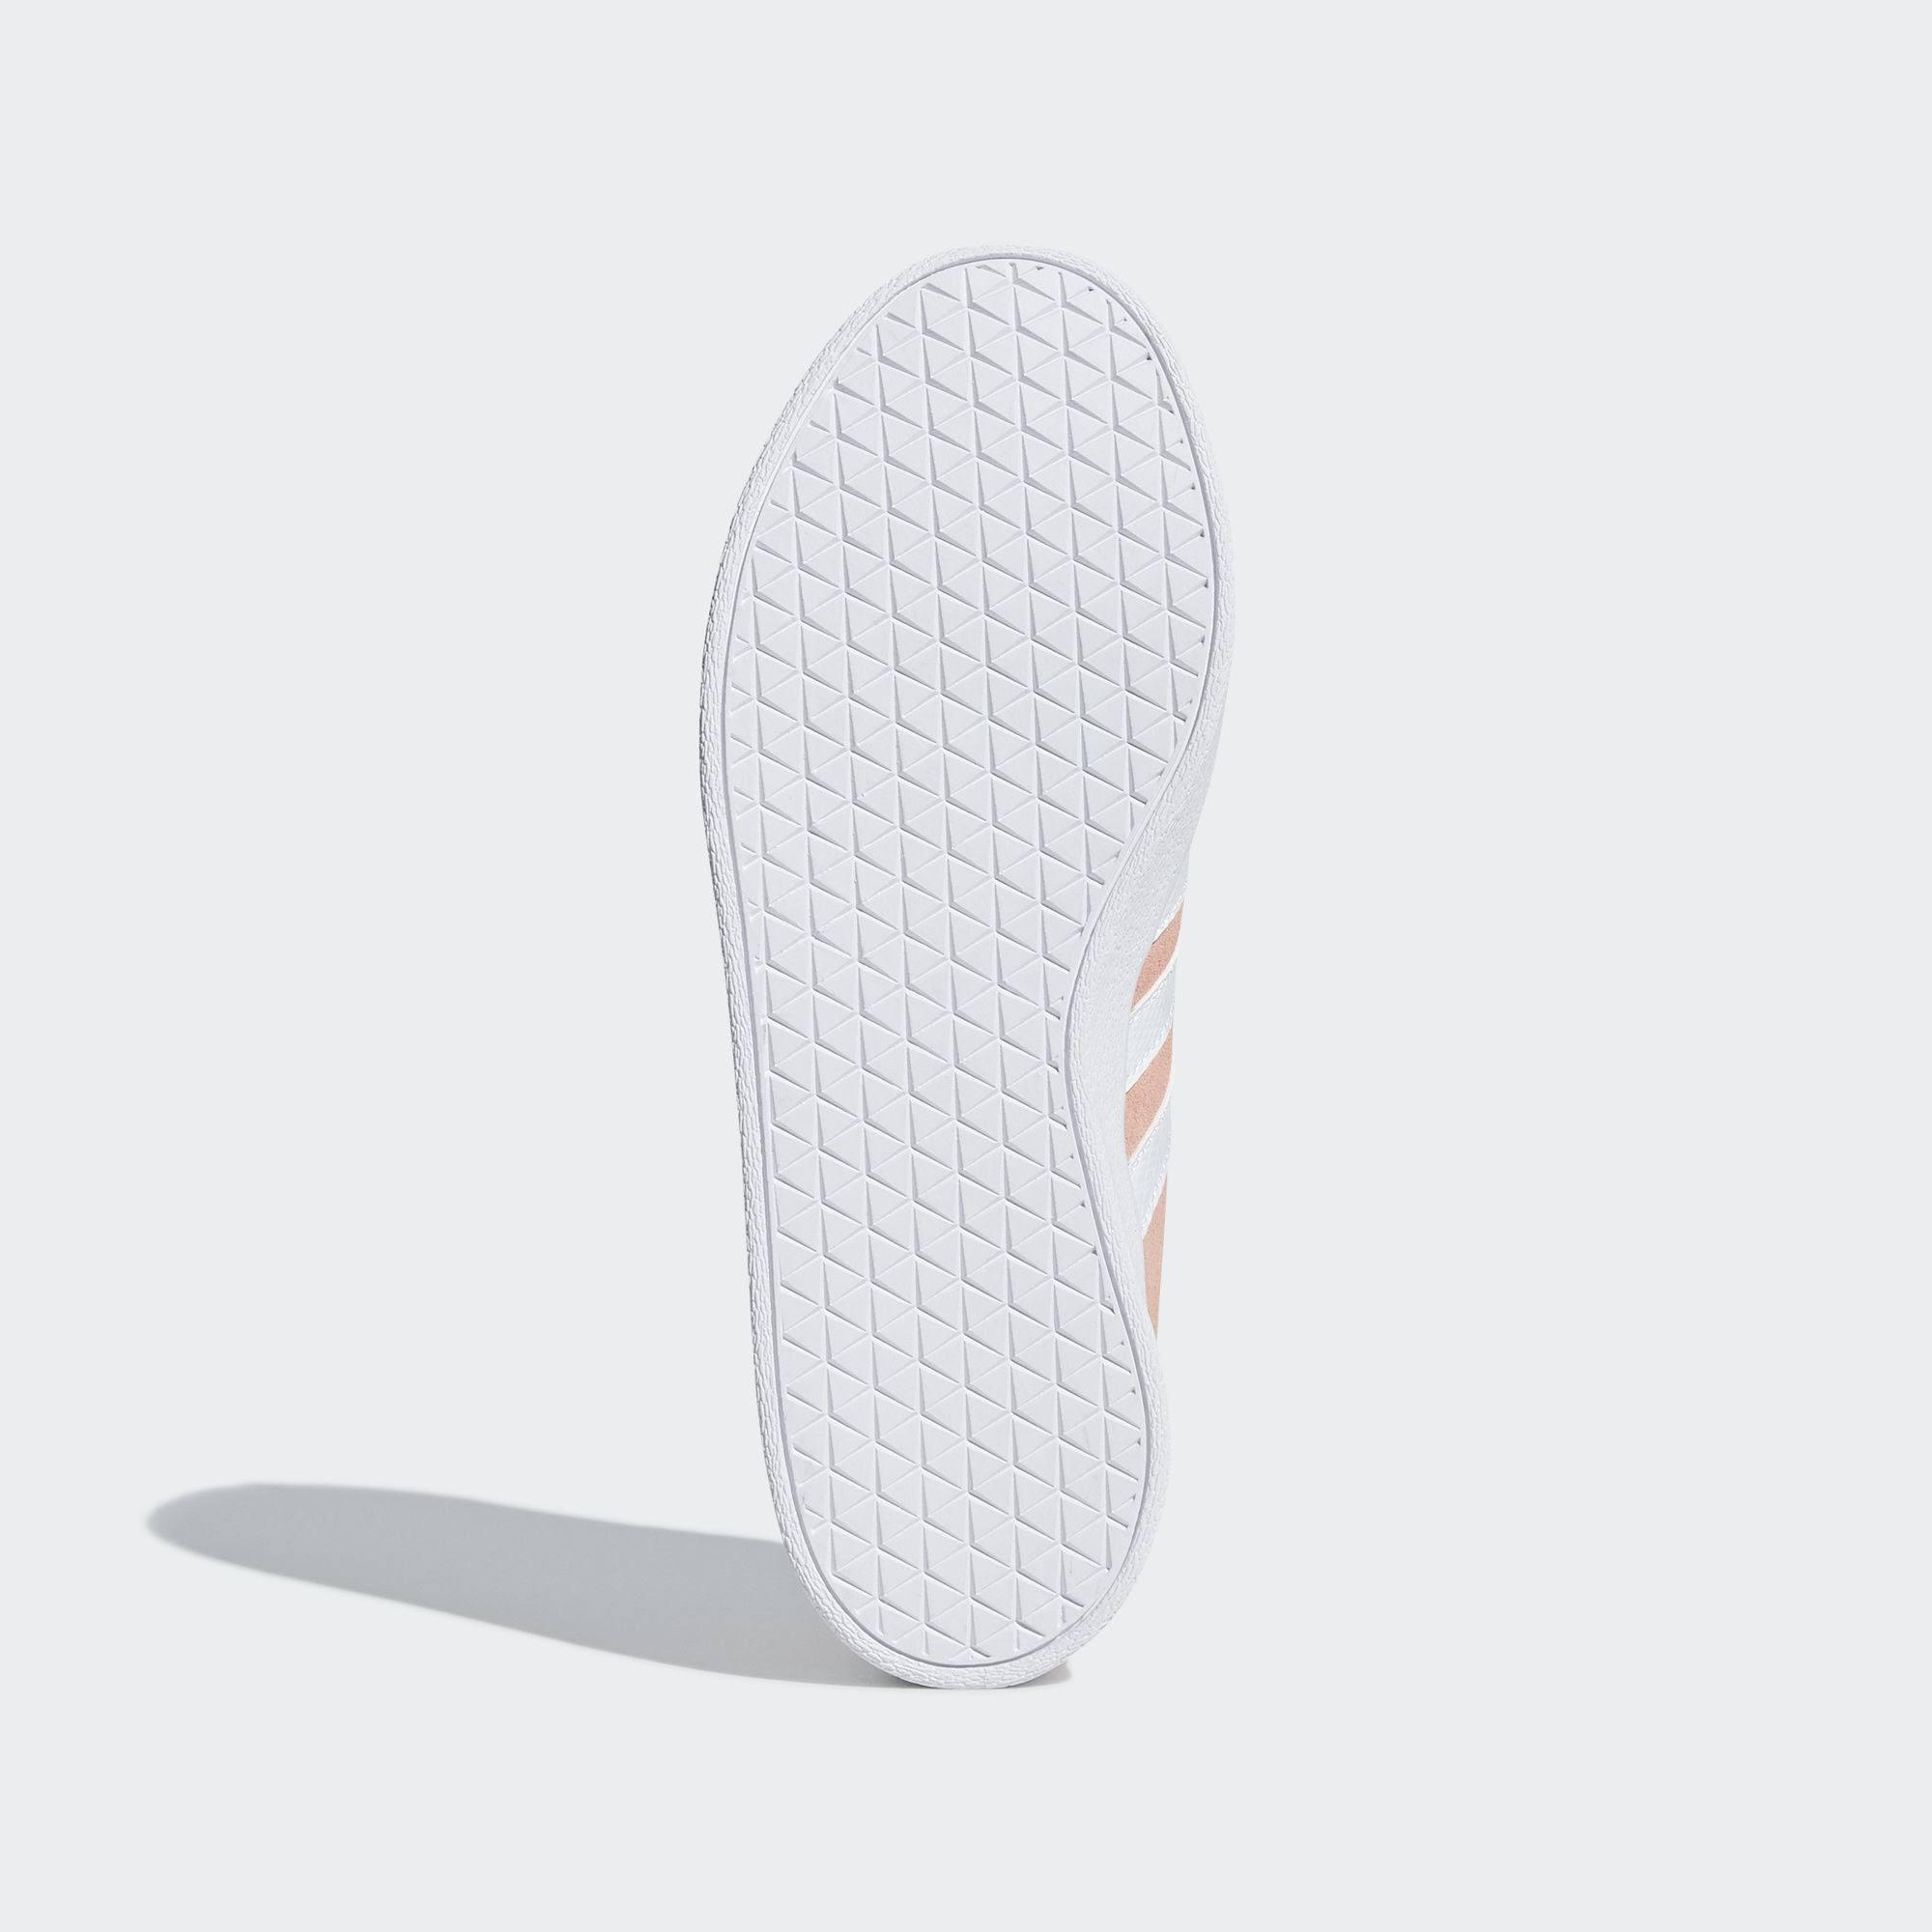 0 Vl Skate Sneakers Adidas Duspnkftw 2 Dames Court HYWDEI29